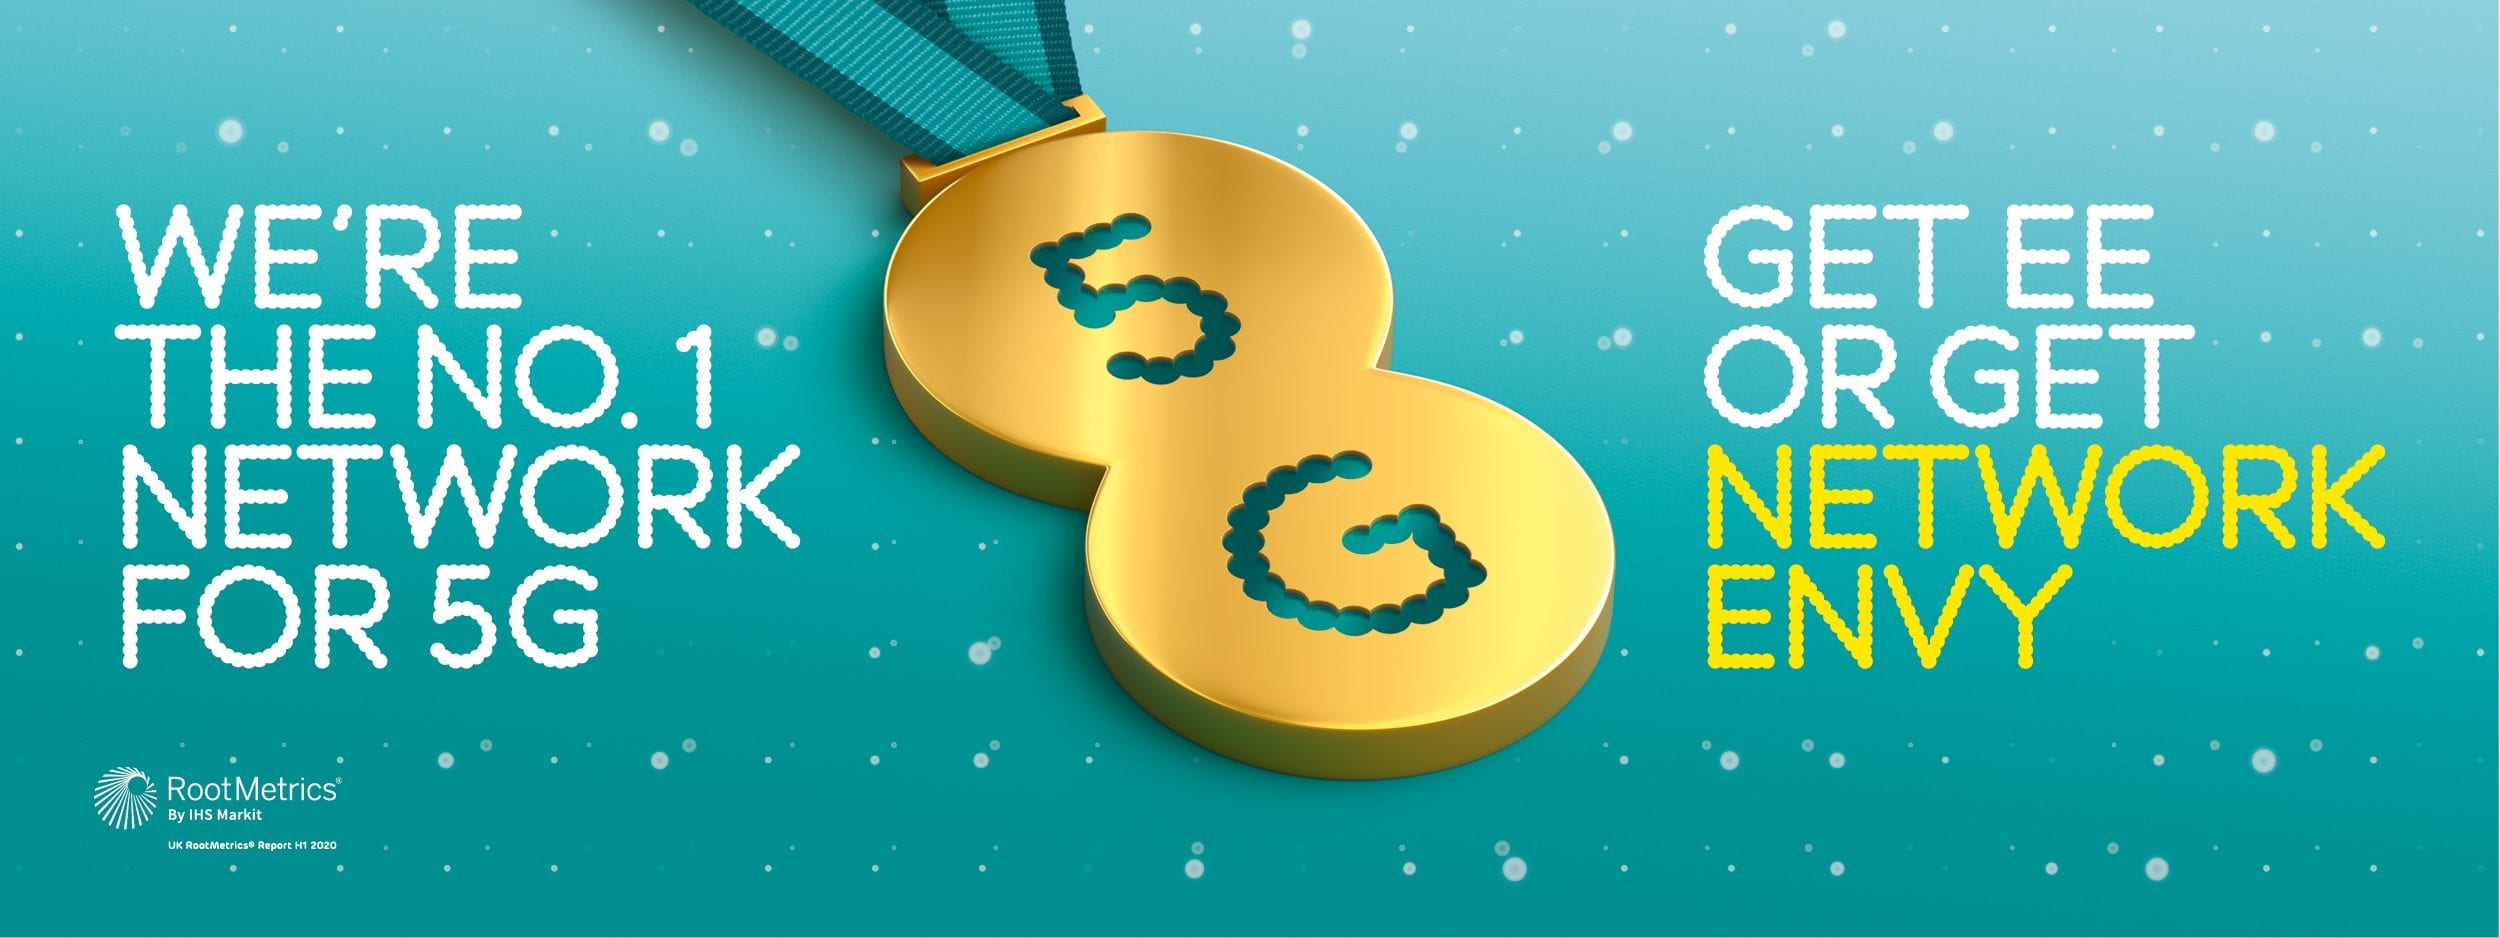 5g Medal Blog 1200 X 450 (1)